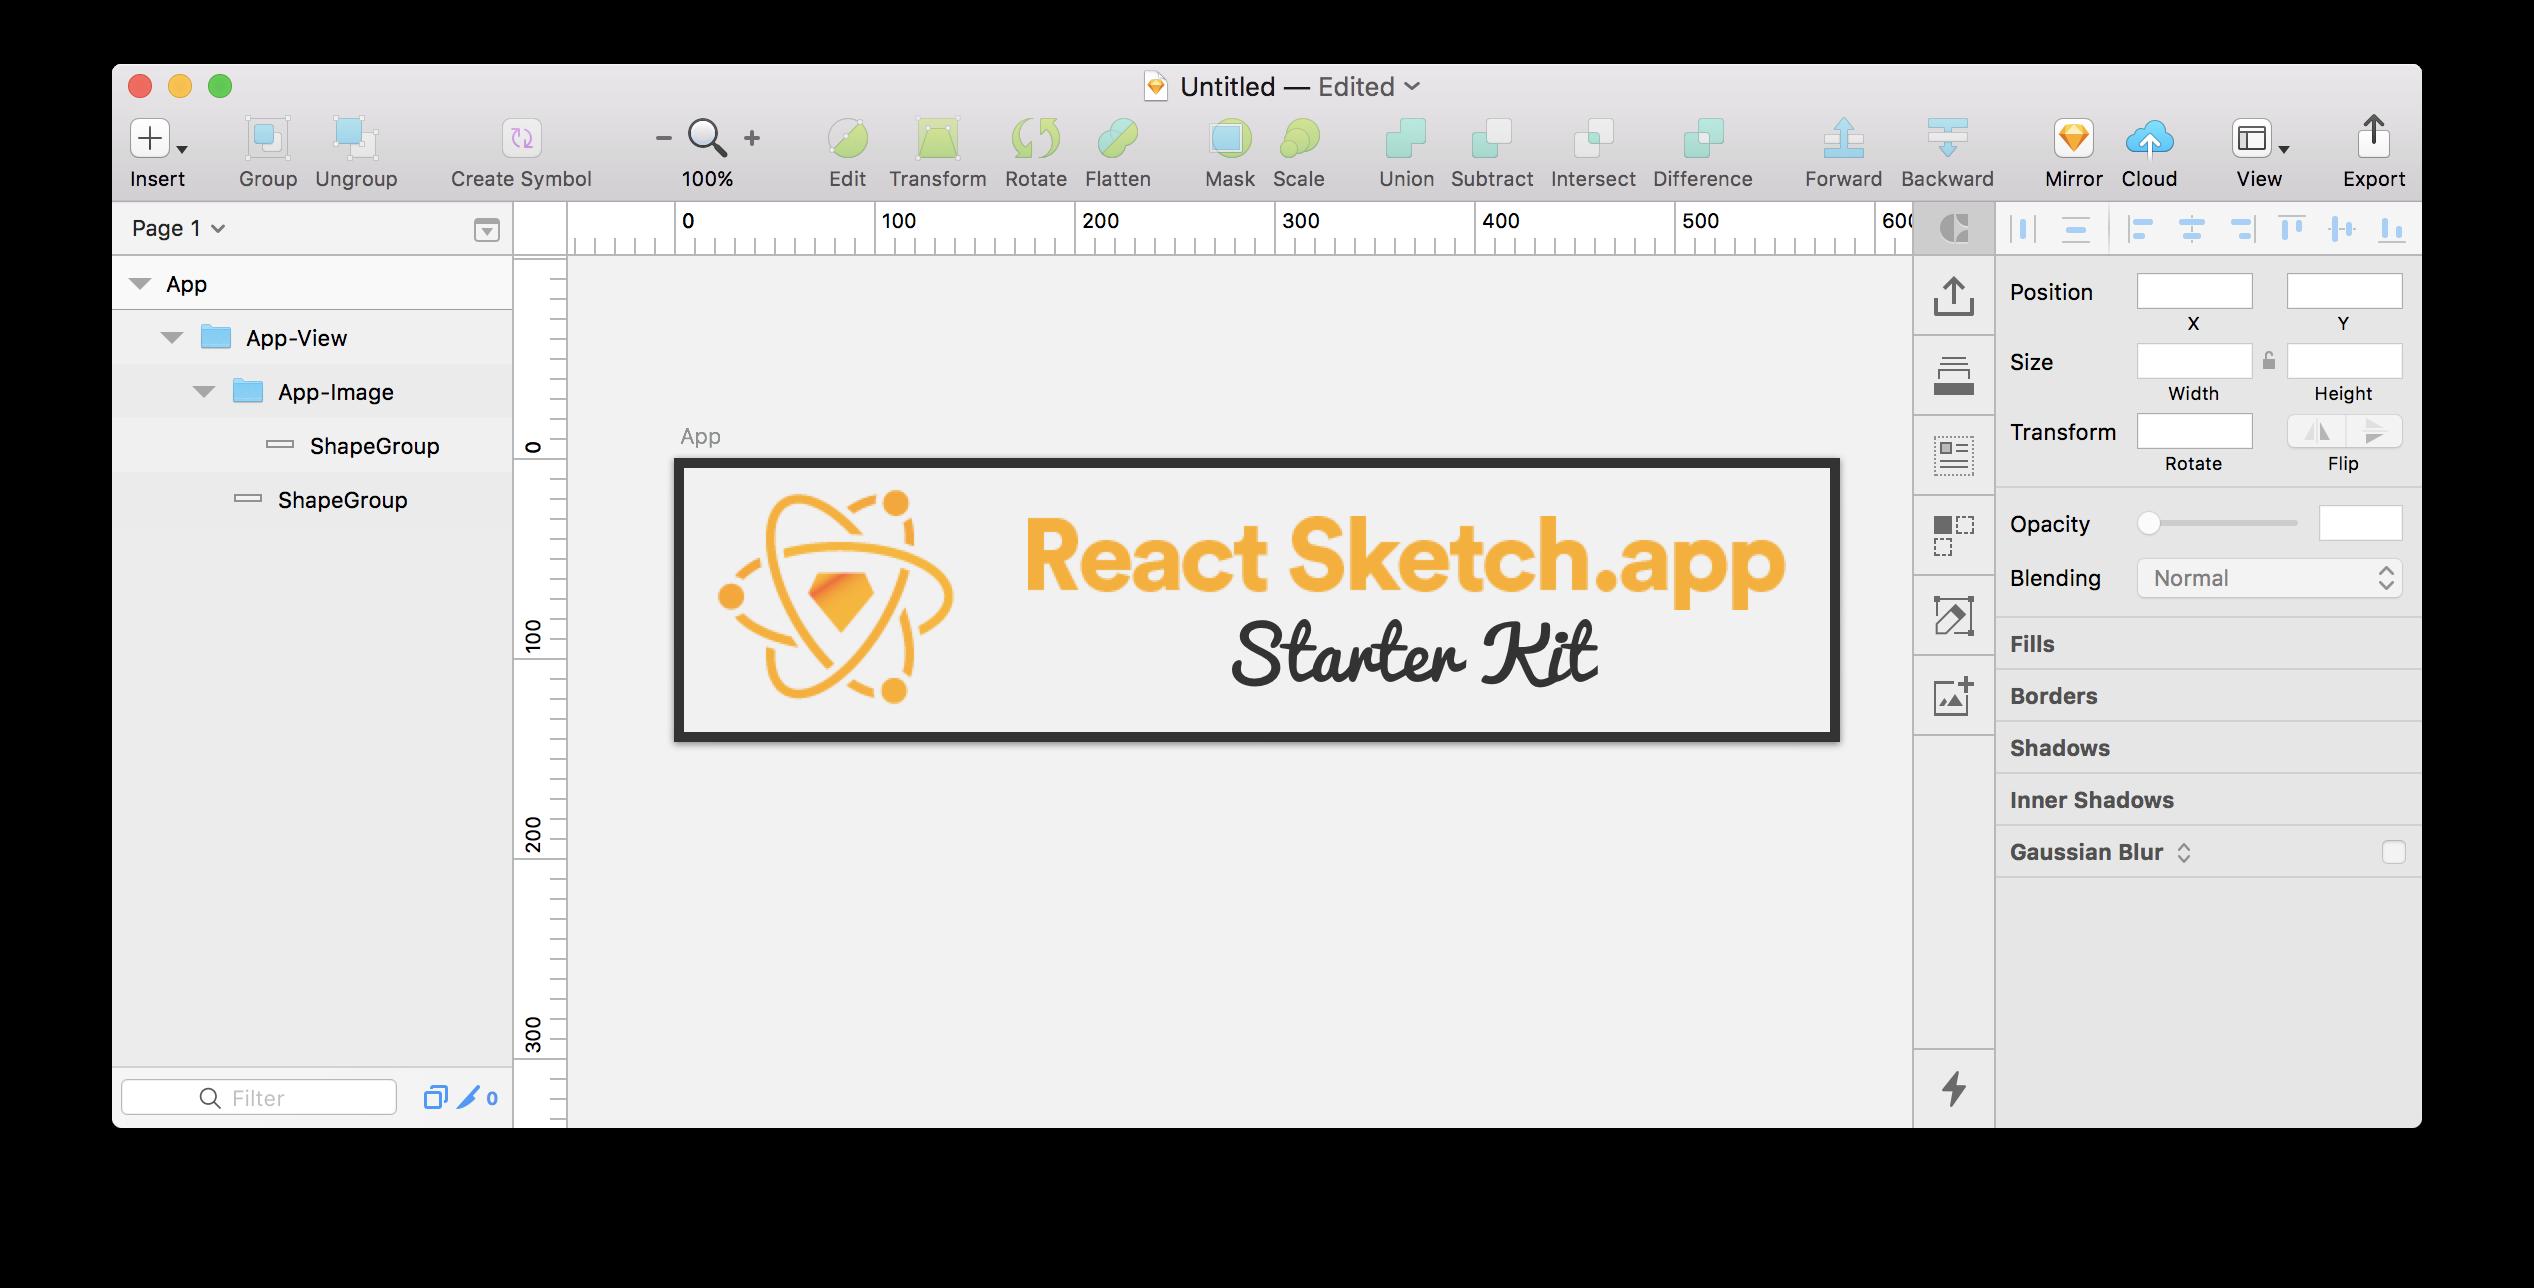 react-sketchapp-starter-kit result